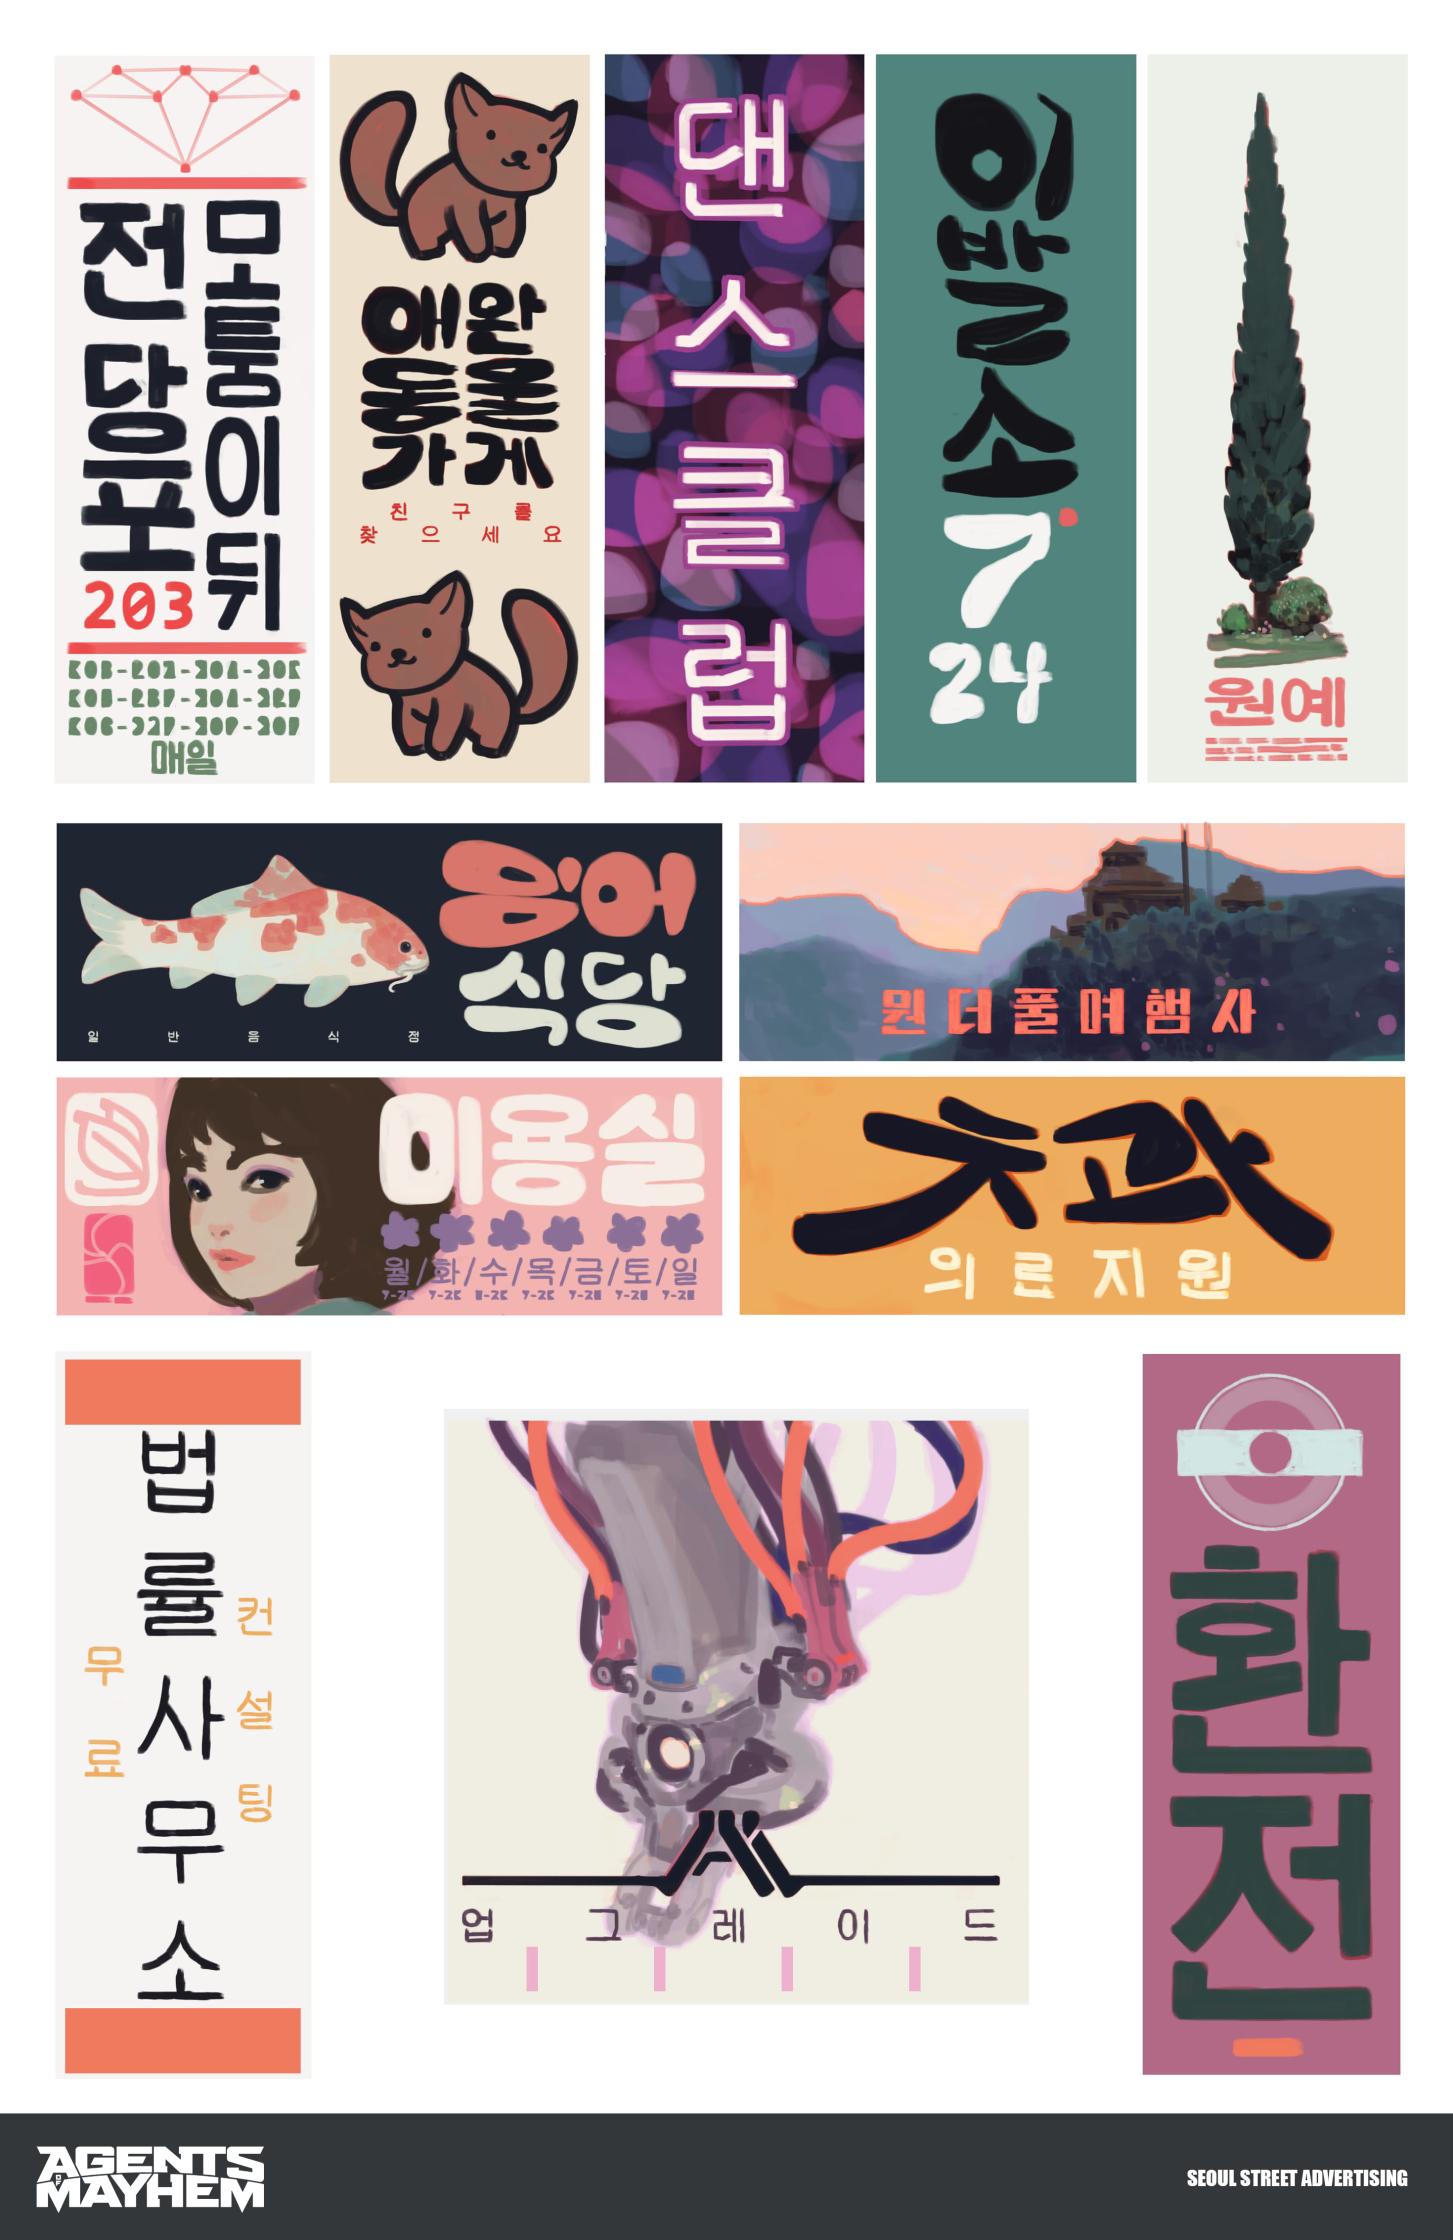 aom_Seoul_street_ads_2.jpg